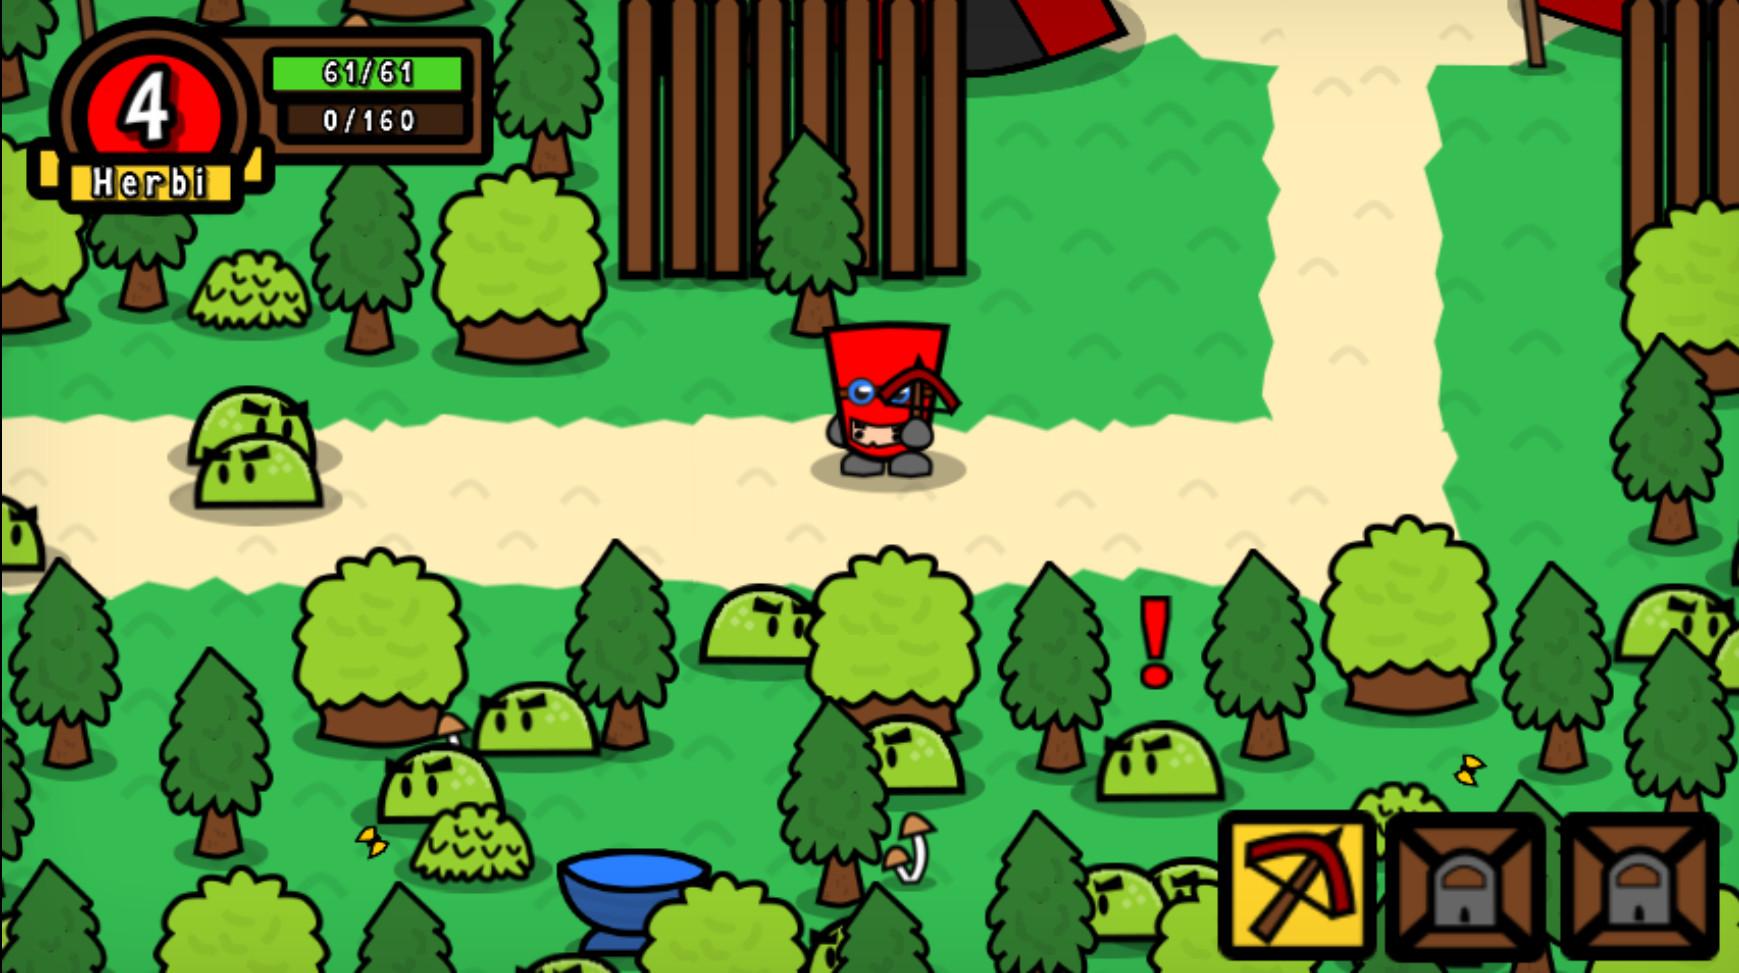 Showdown Adventure Screenshot 1